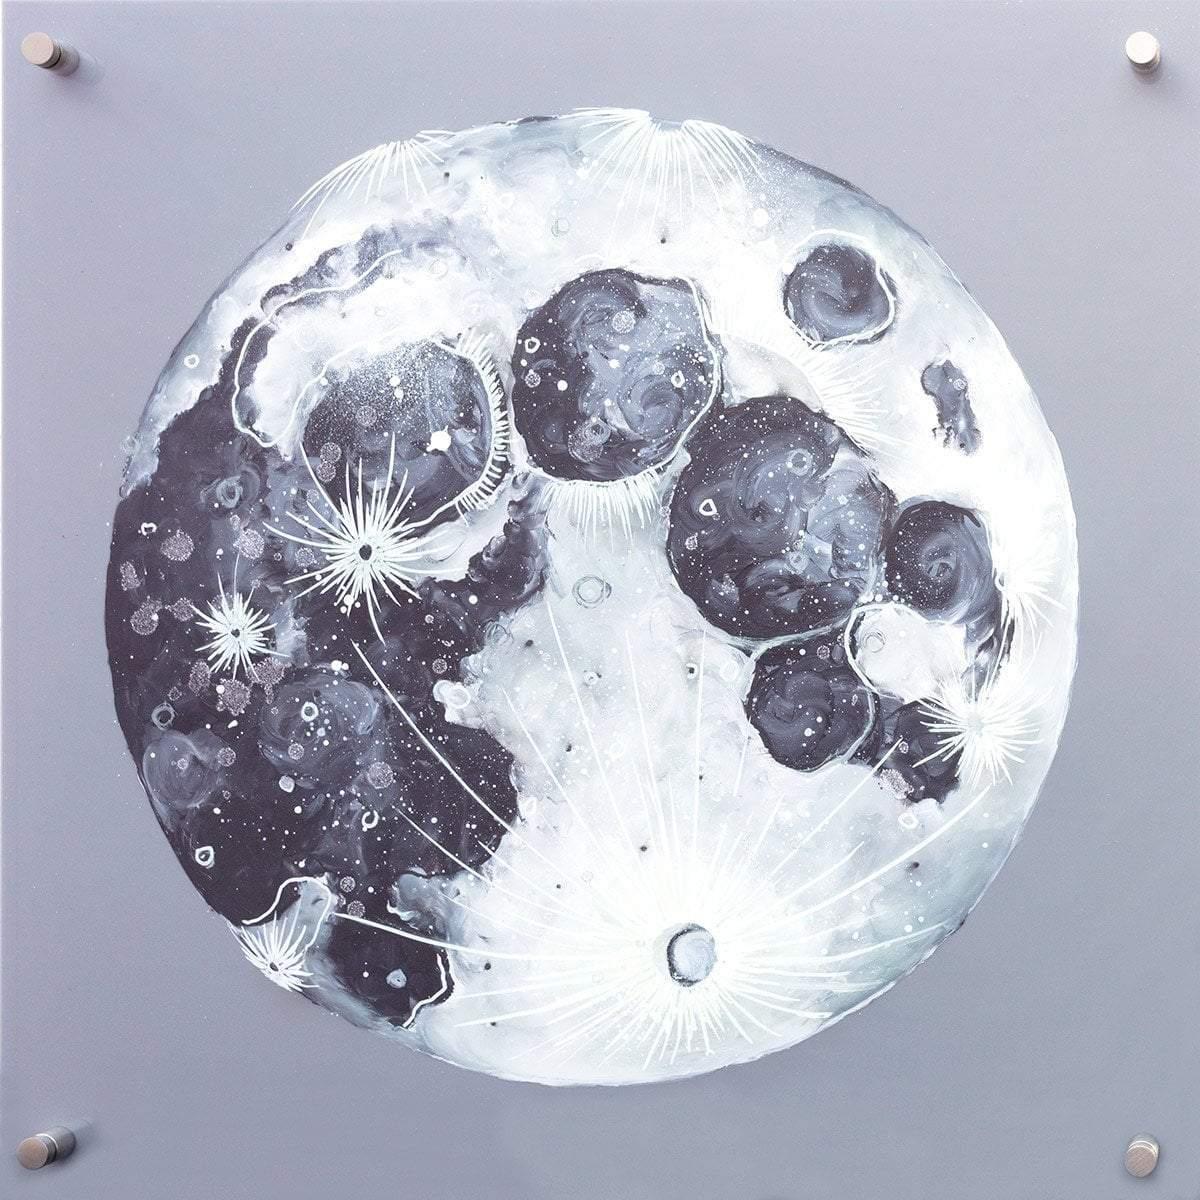 A Full Moon - Becky Smith